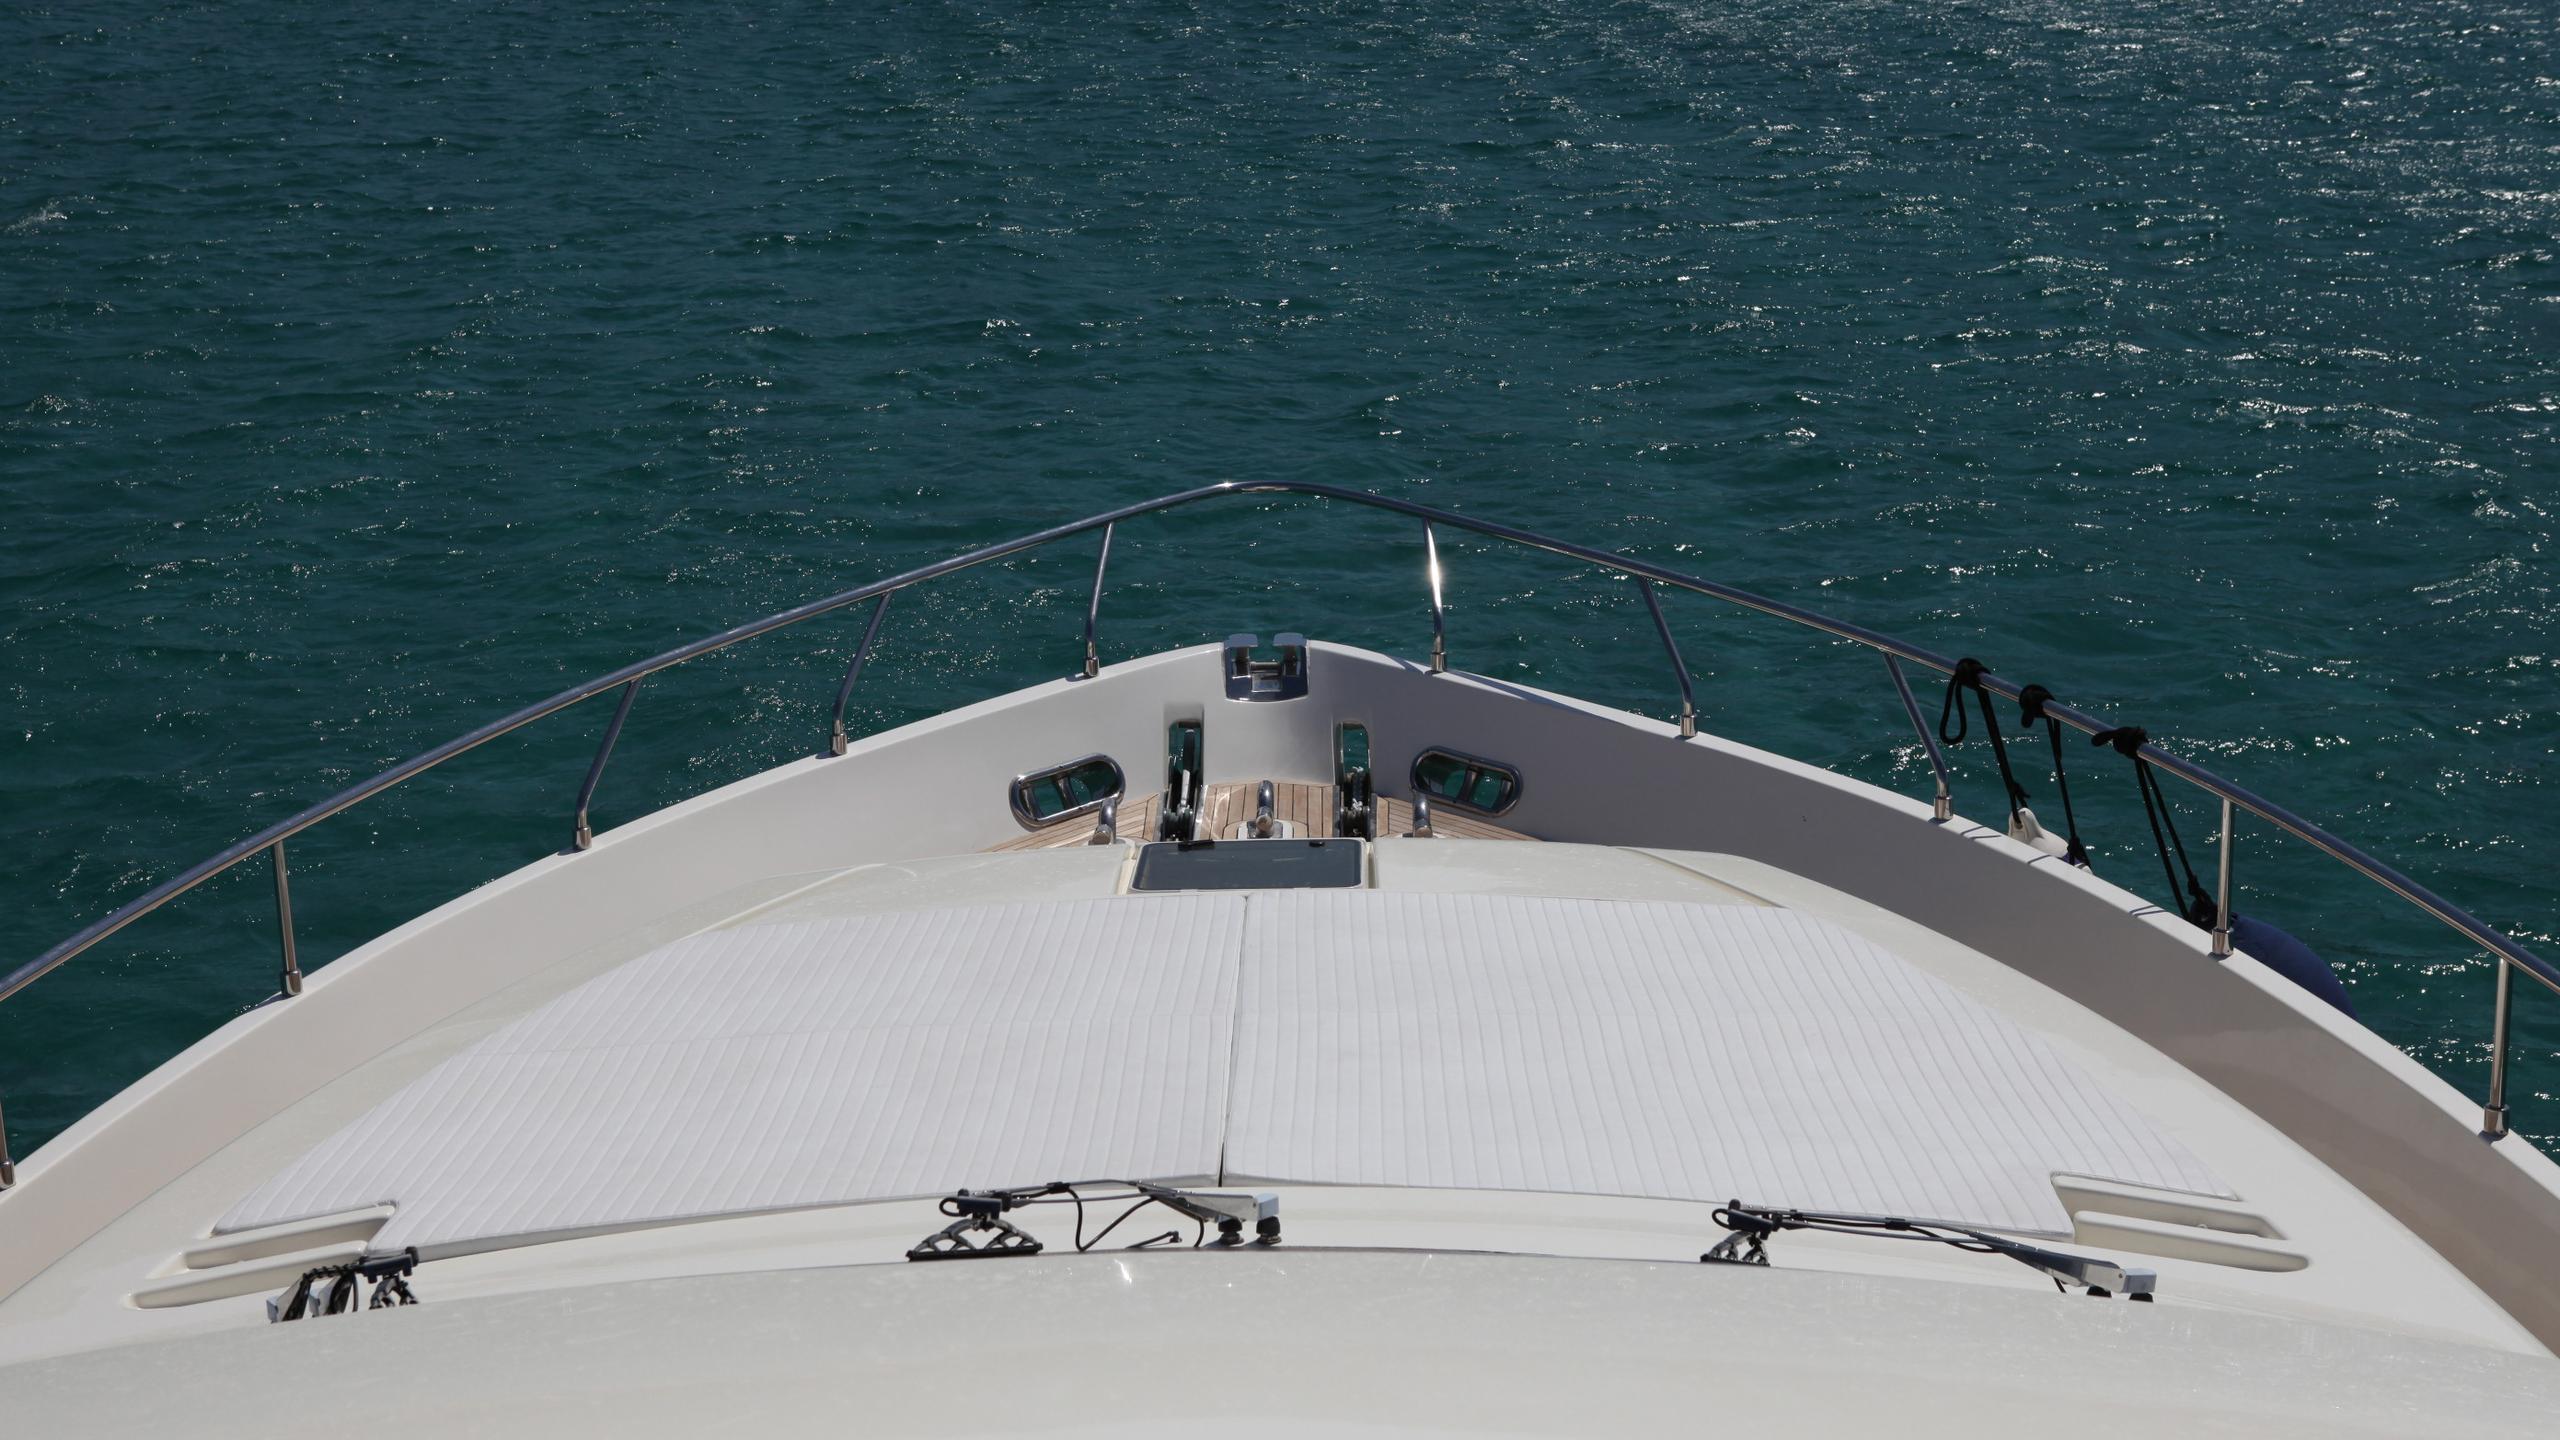 kentavros-ii-yacht-bow